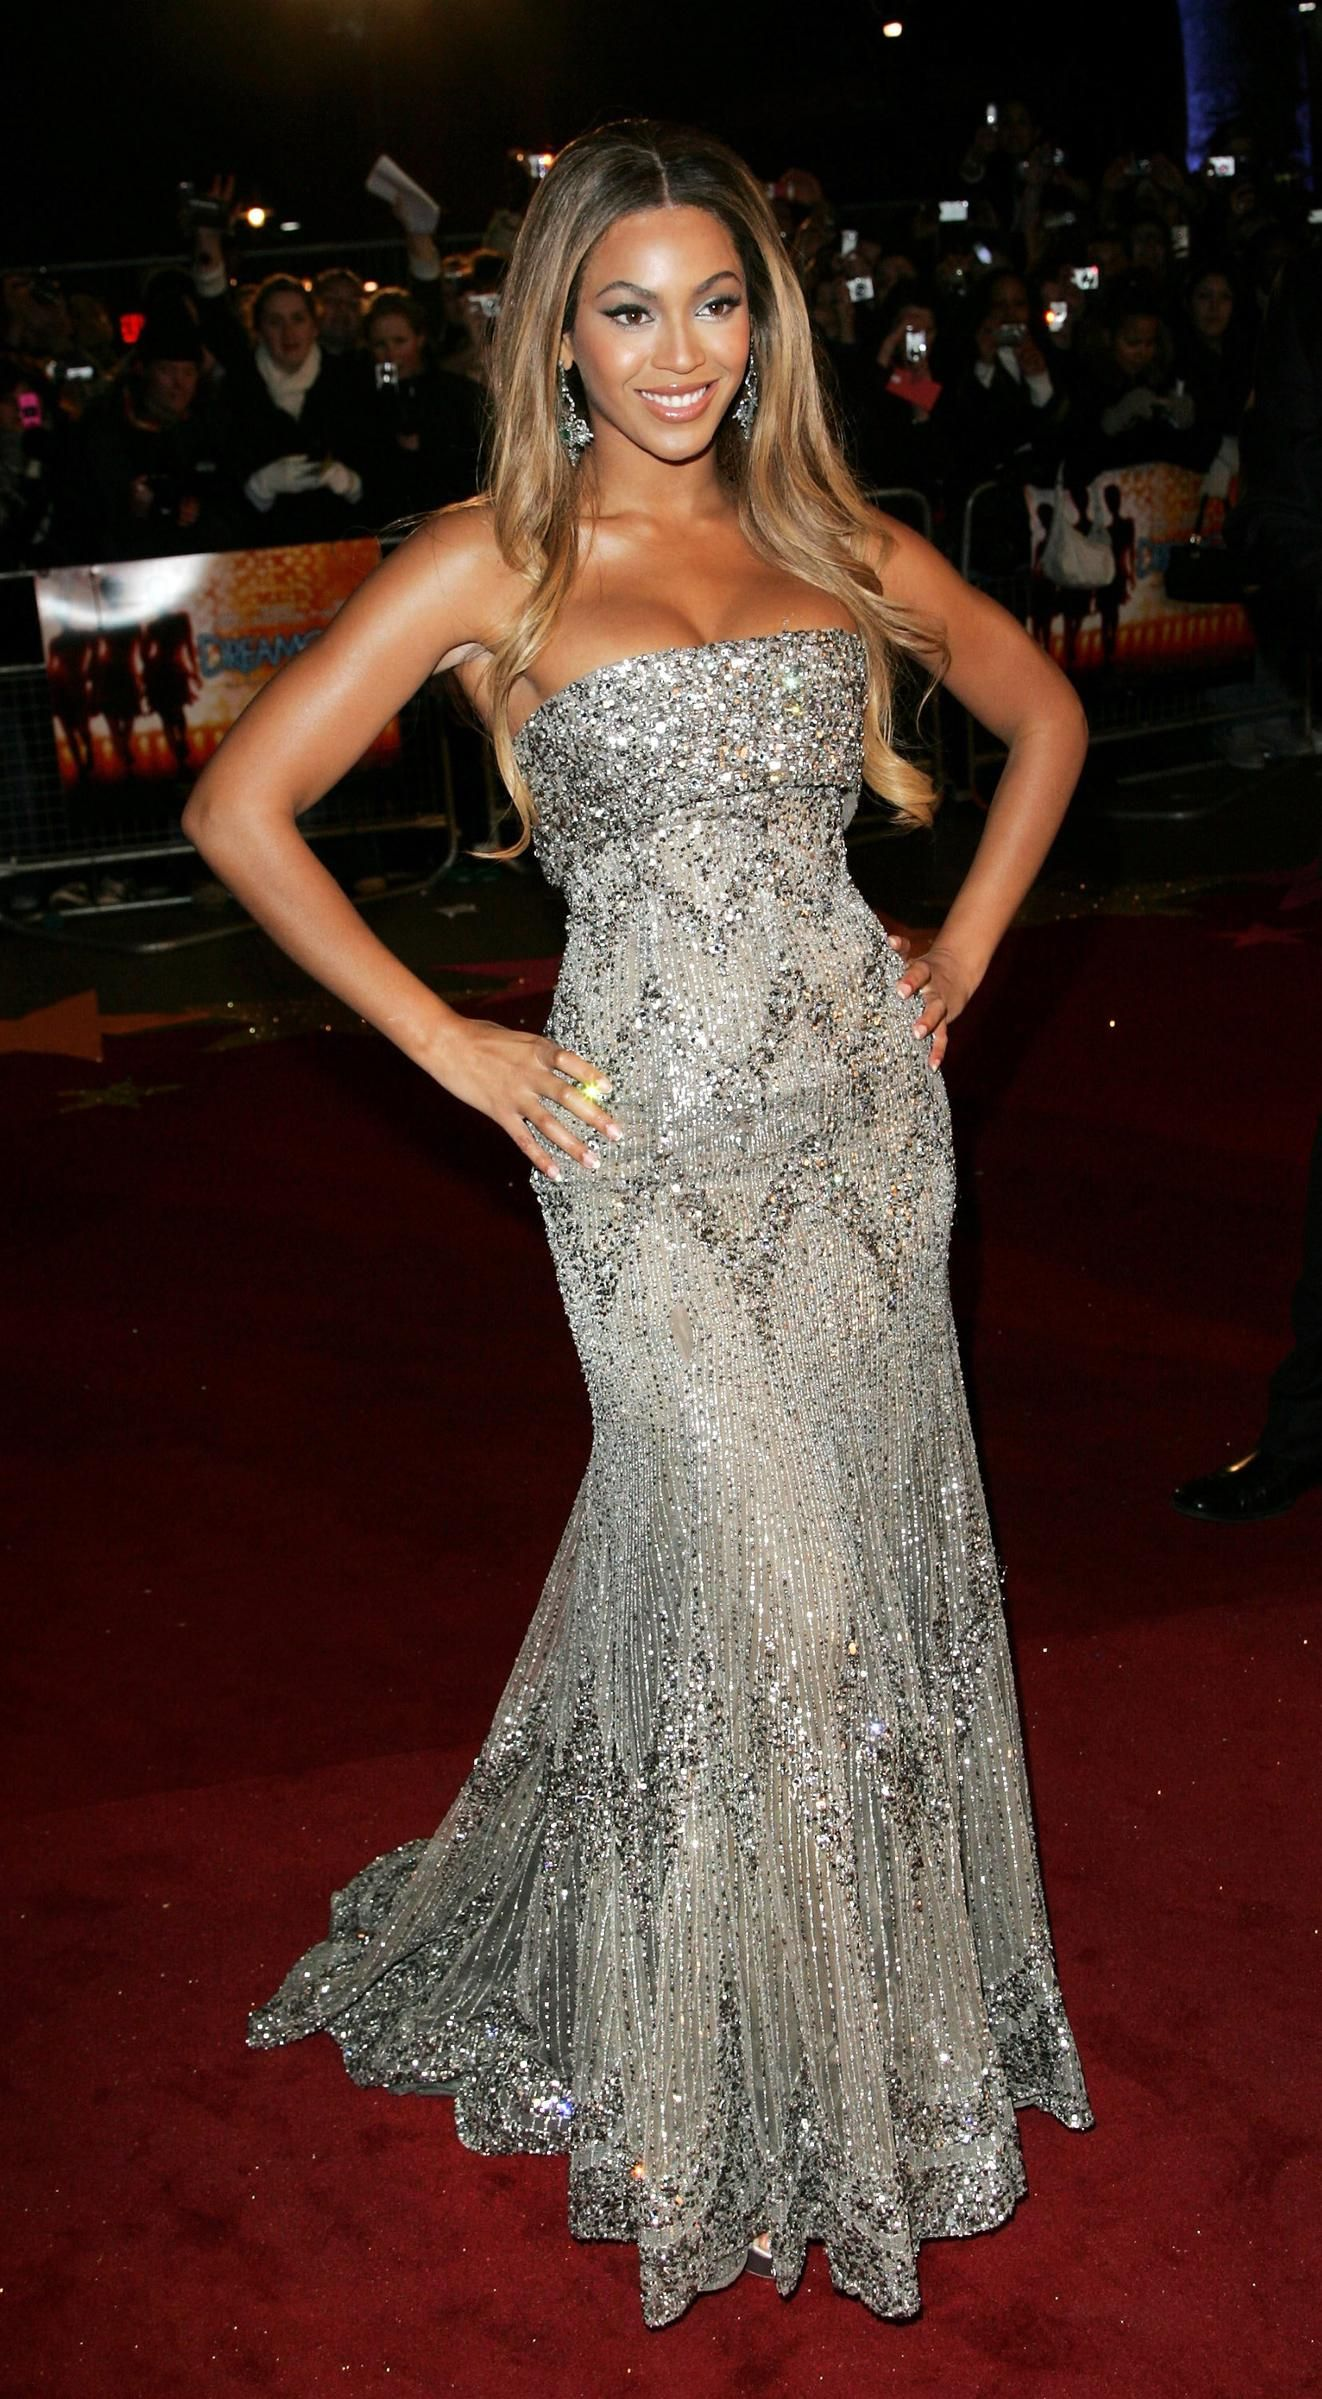 Beyonce - Dreamgirls Premiere 2007 - Stunning Diva Glam jaglady dba9b0b58e5f